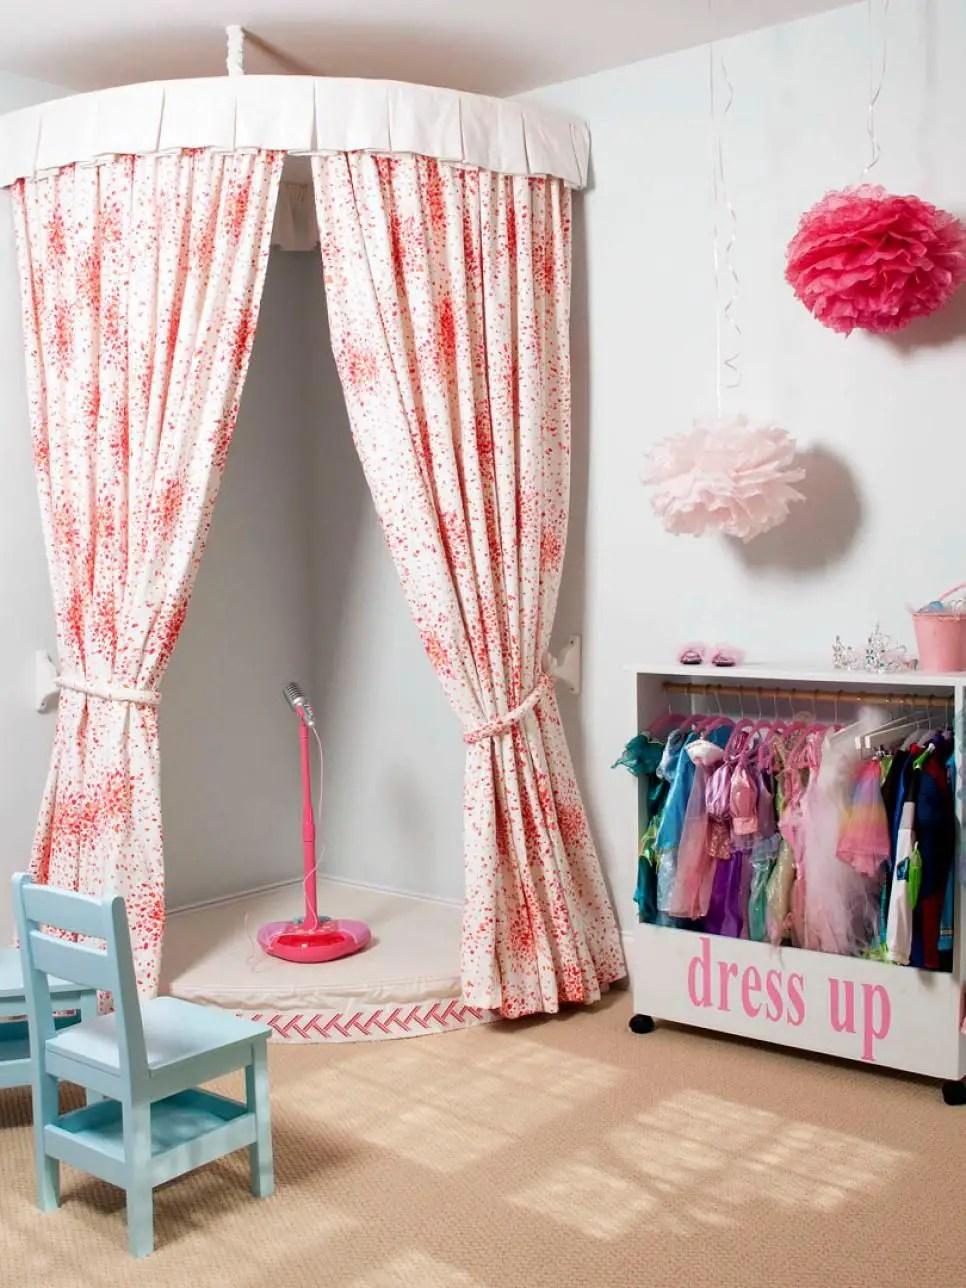 Diy Playroom Ideas 41